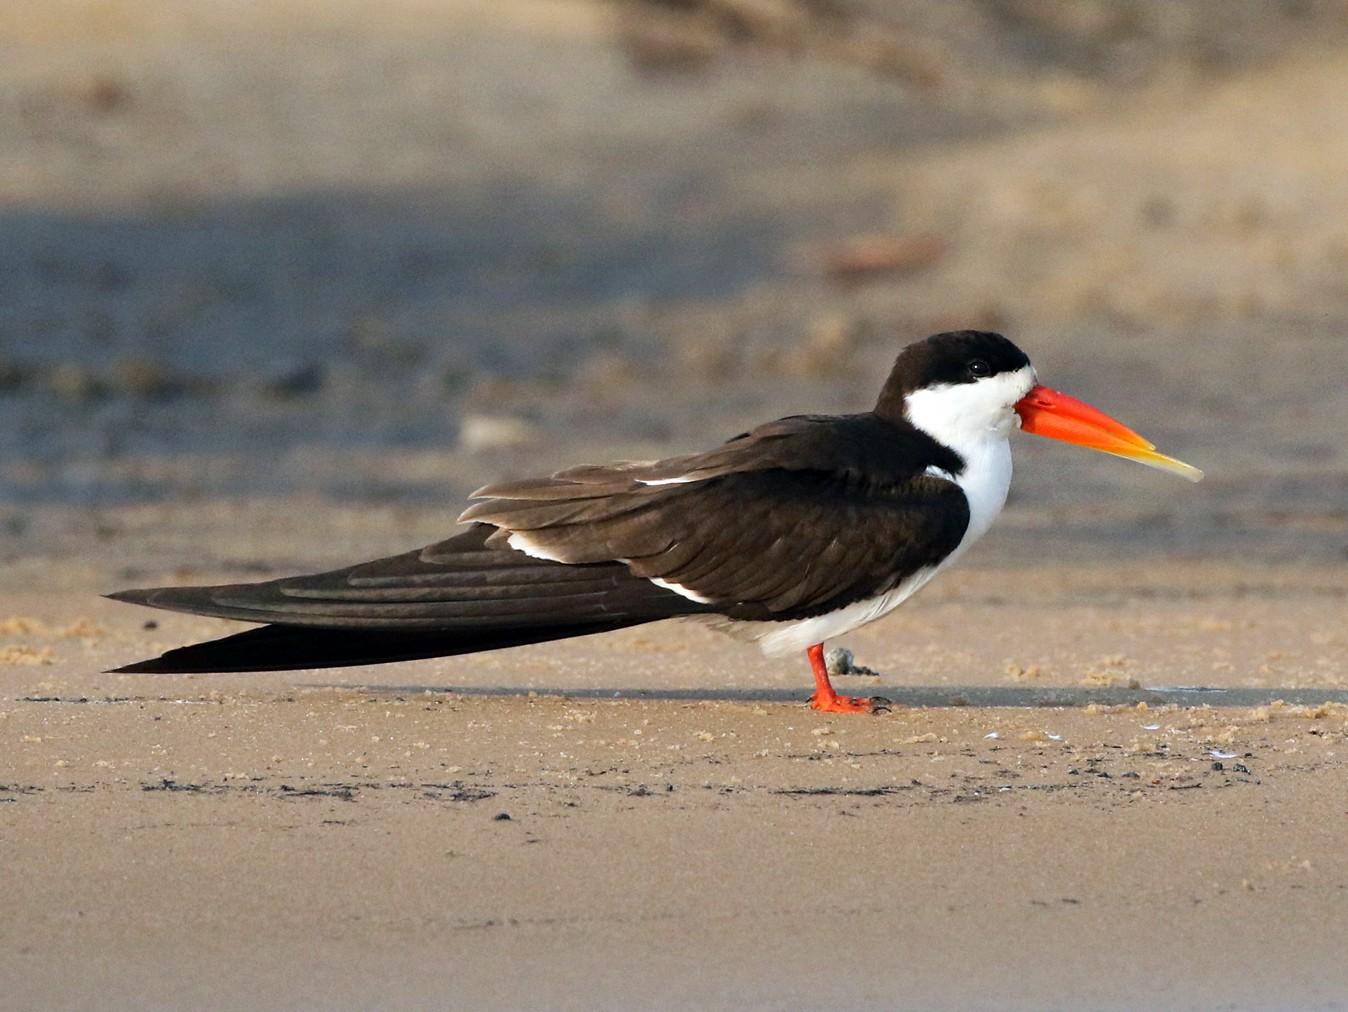 African Skimmer - Charley Hesse TROPICAL BIRDING